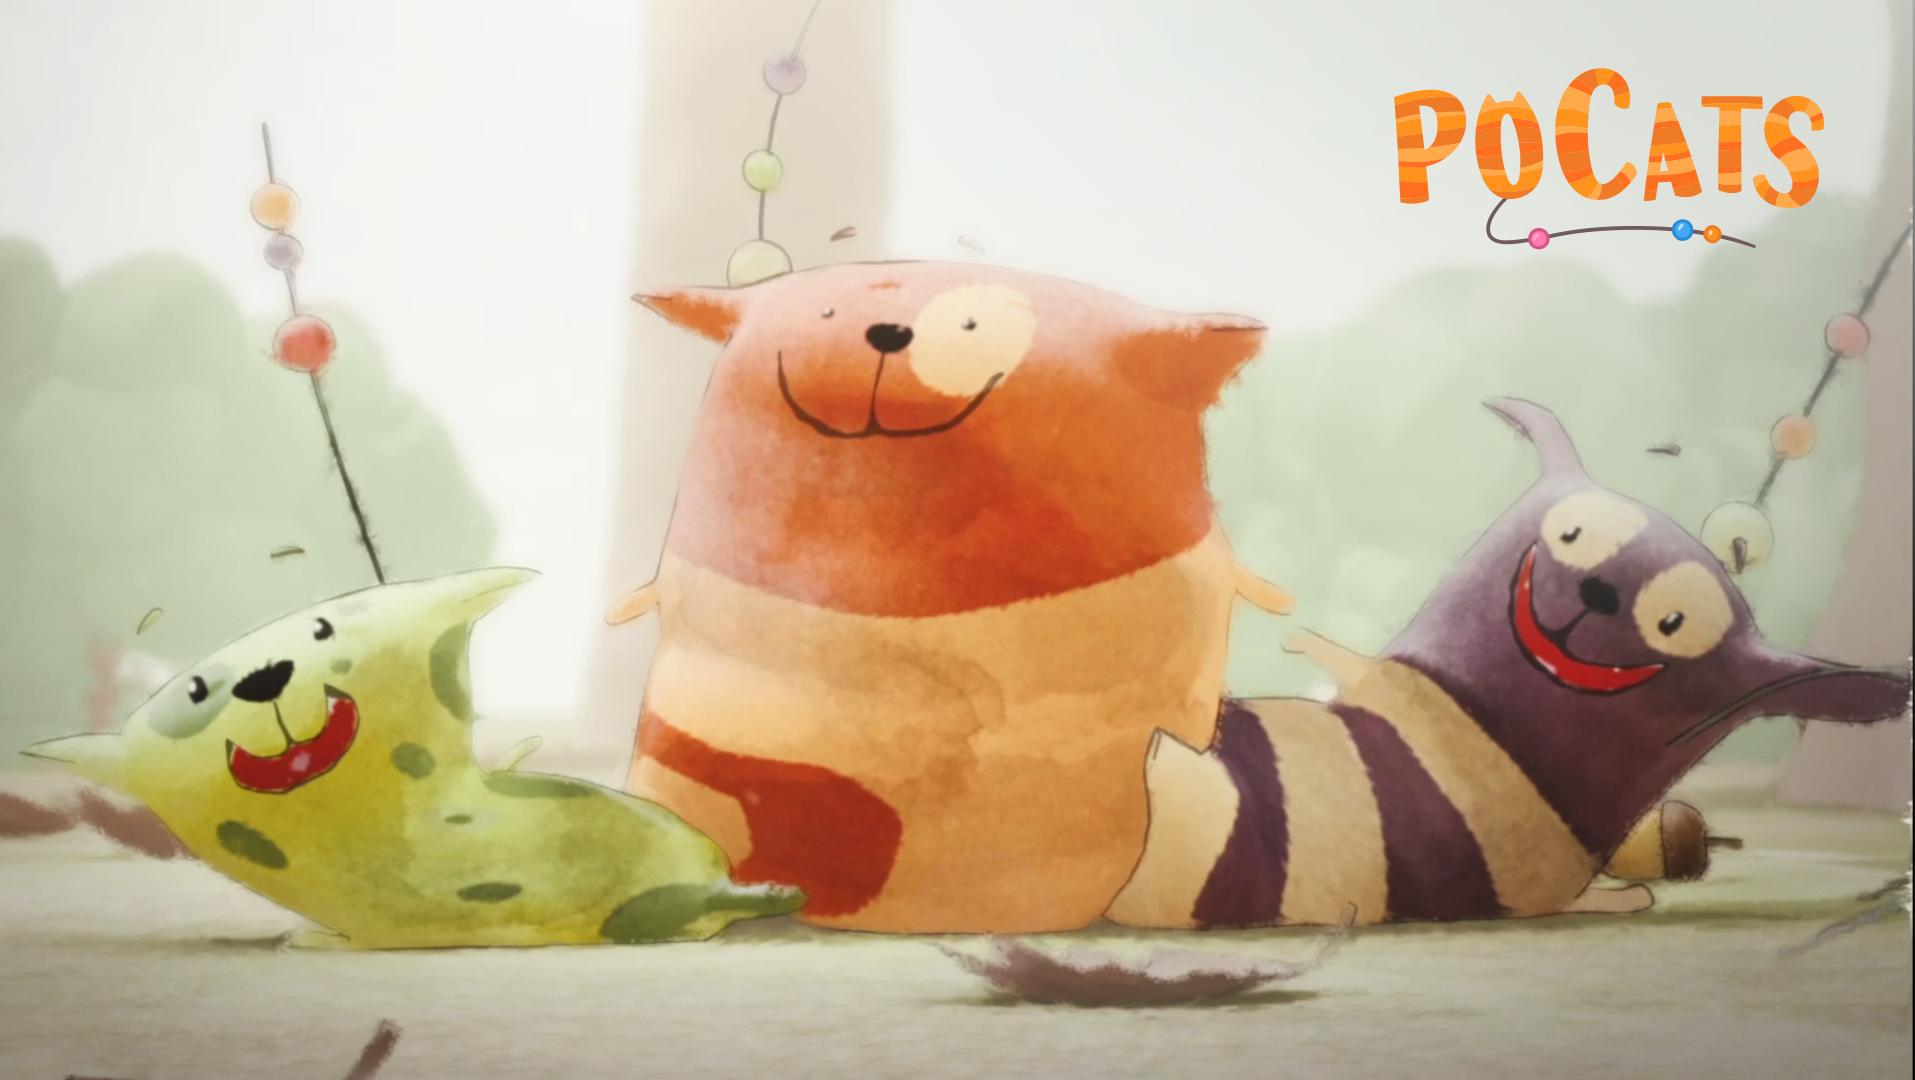 Pocats – Animation Series